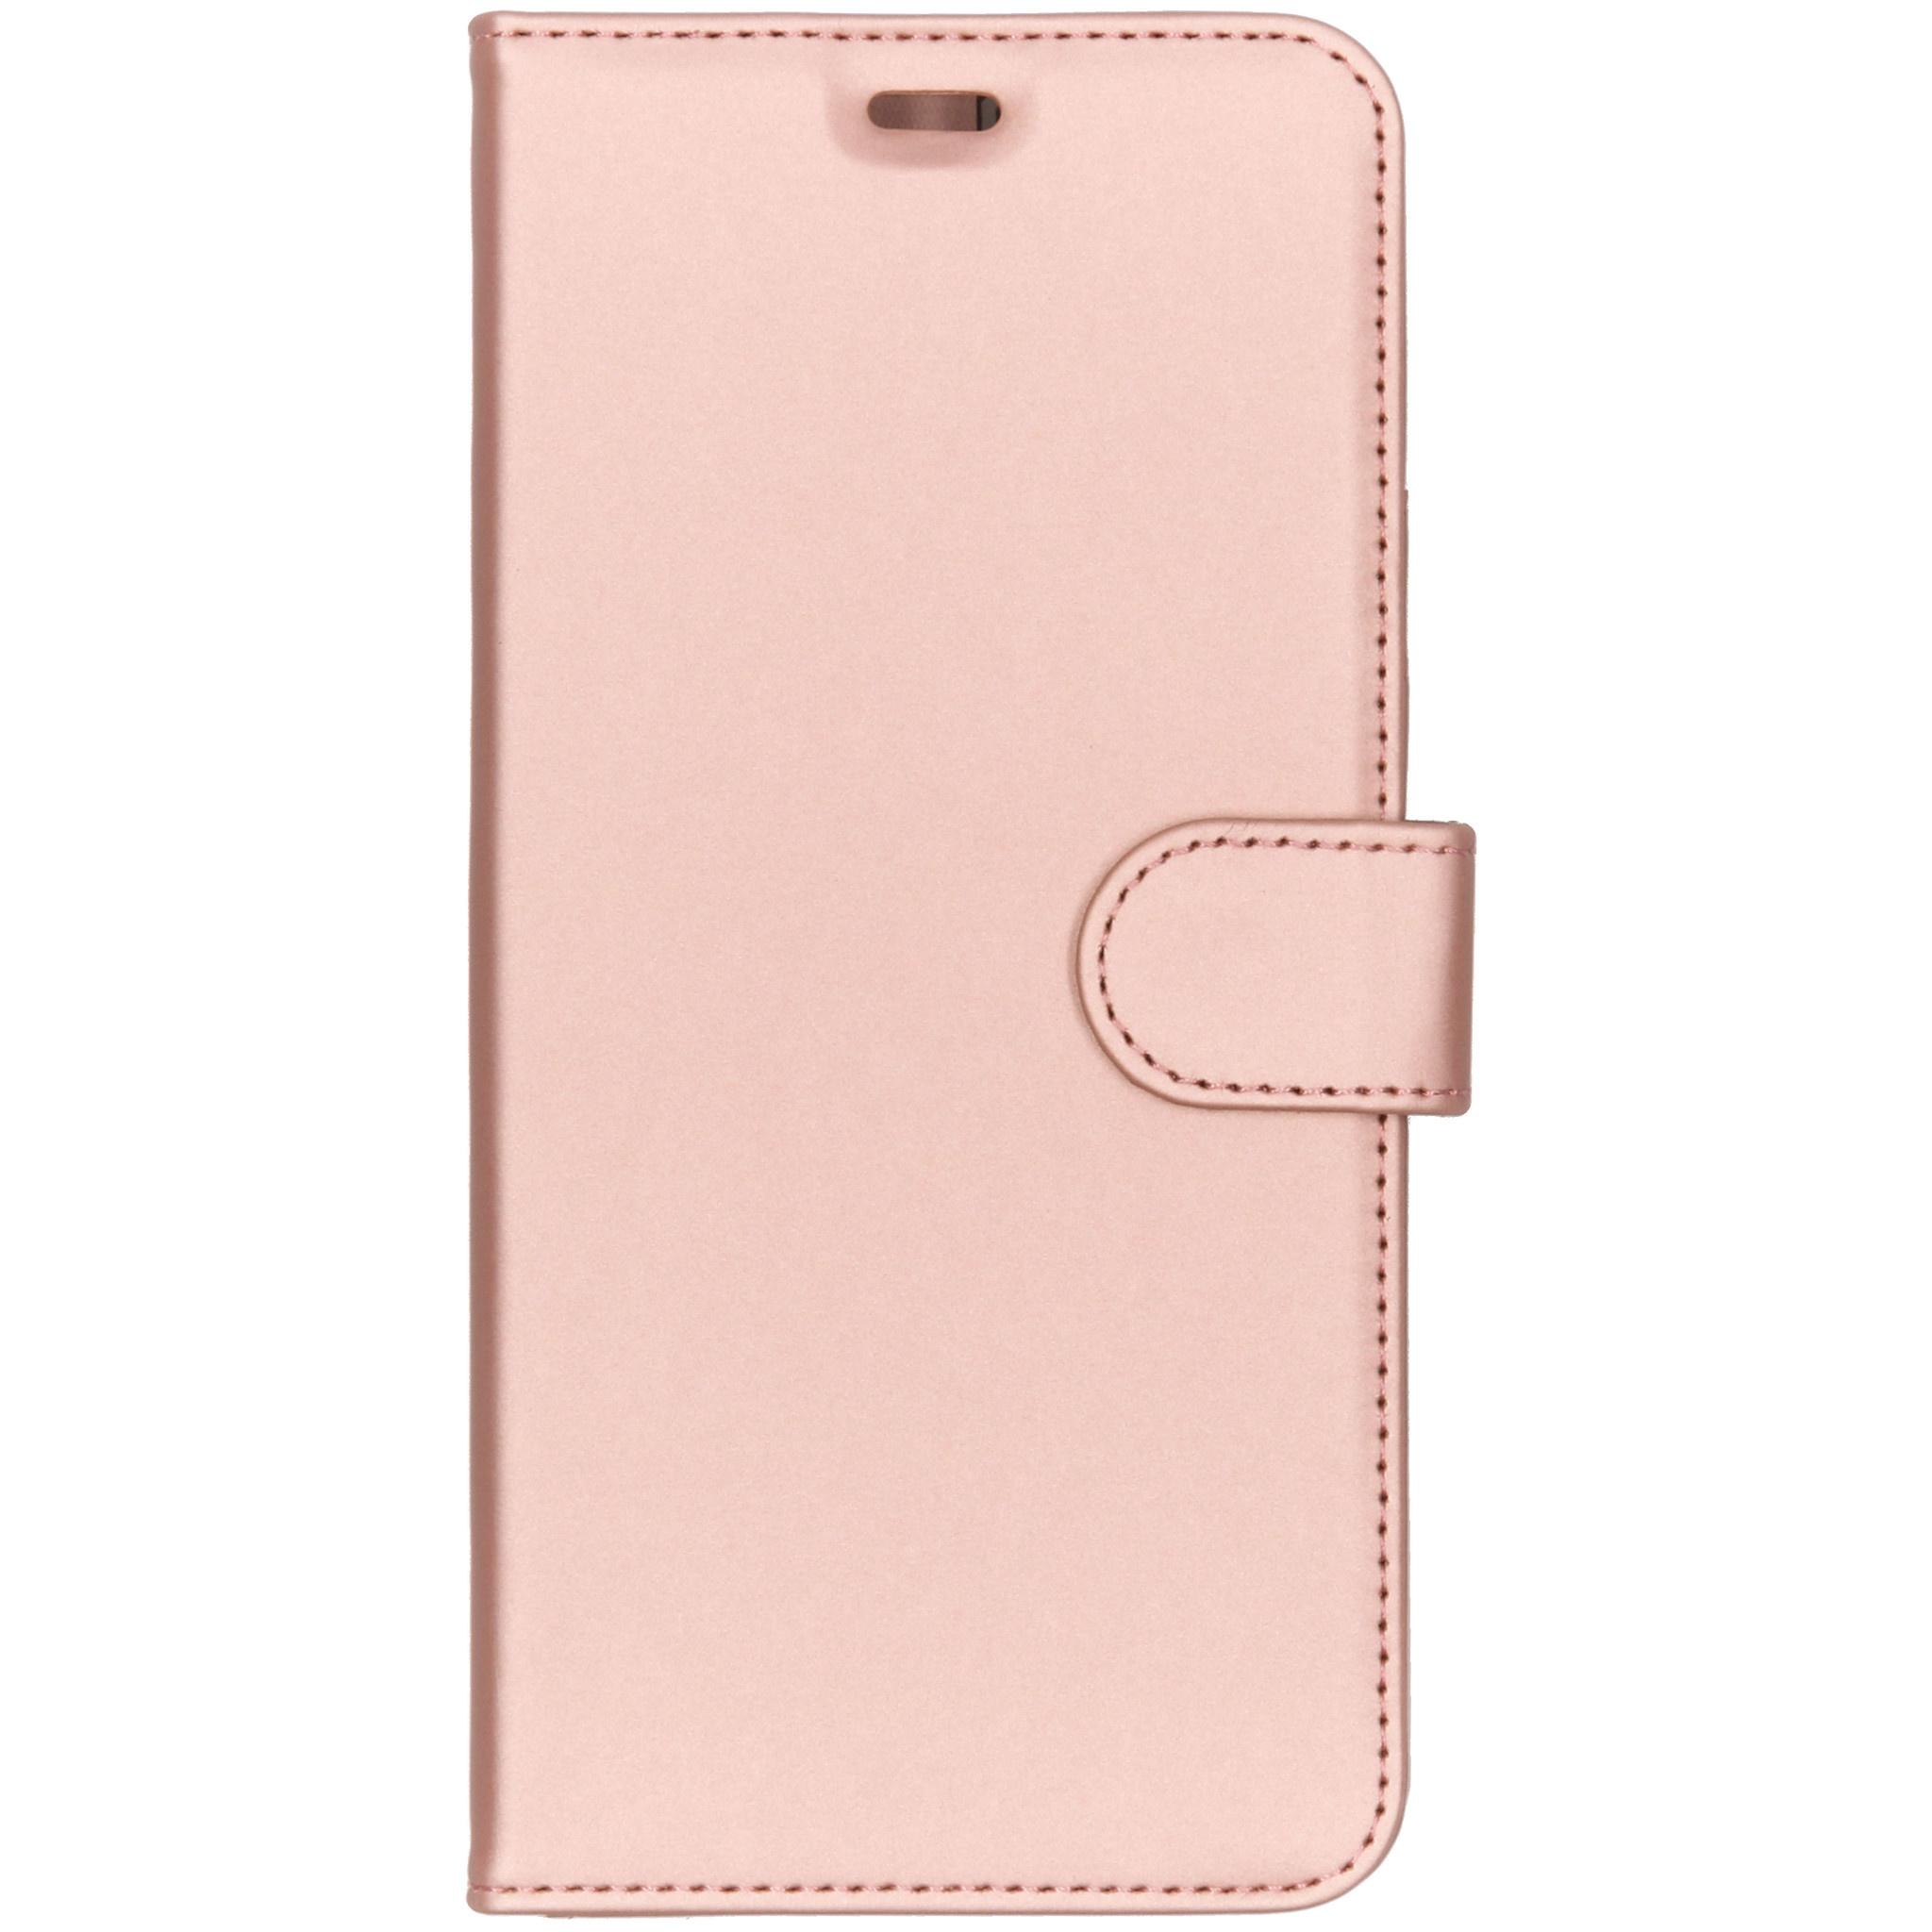 Accezz Wallet TPU Booklet Roségold für das Samsung Galaxy A9 (2018)